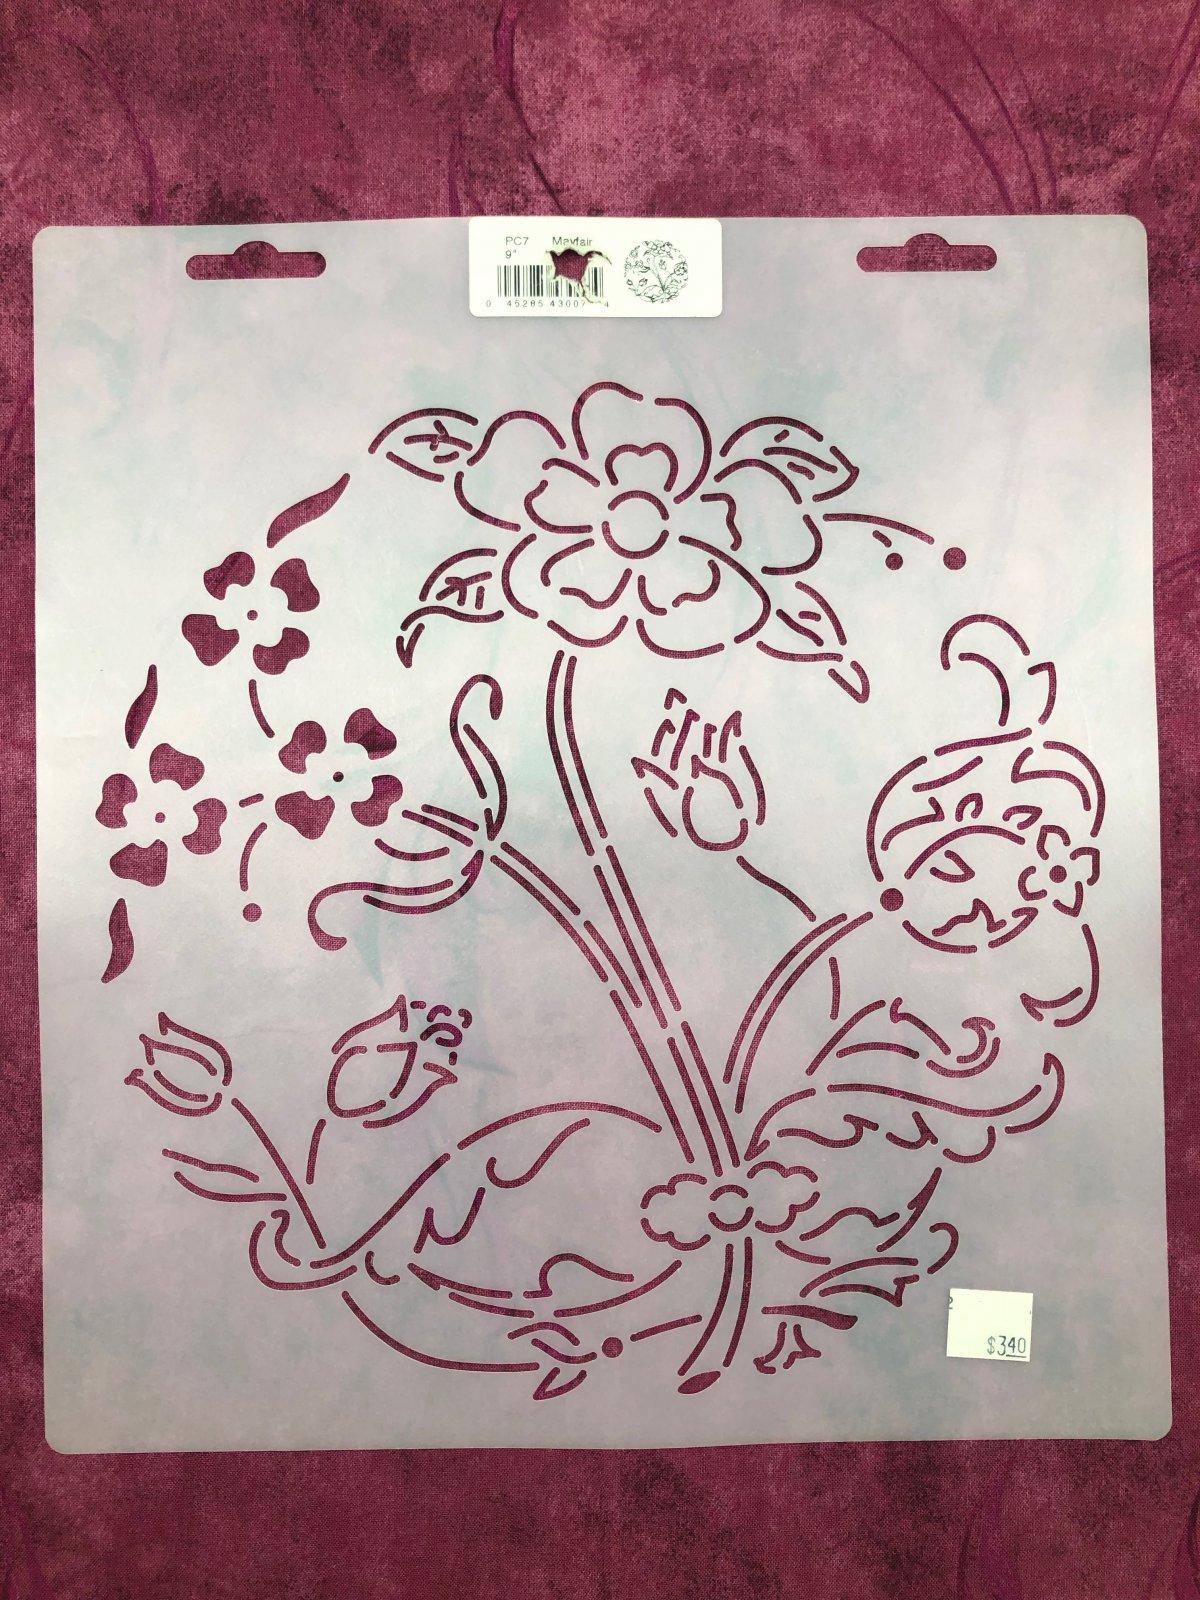 PC7 Mayfair 9 Inch Stencil